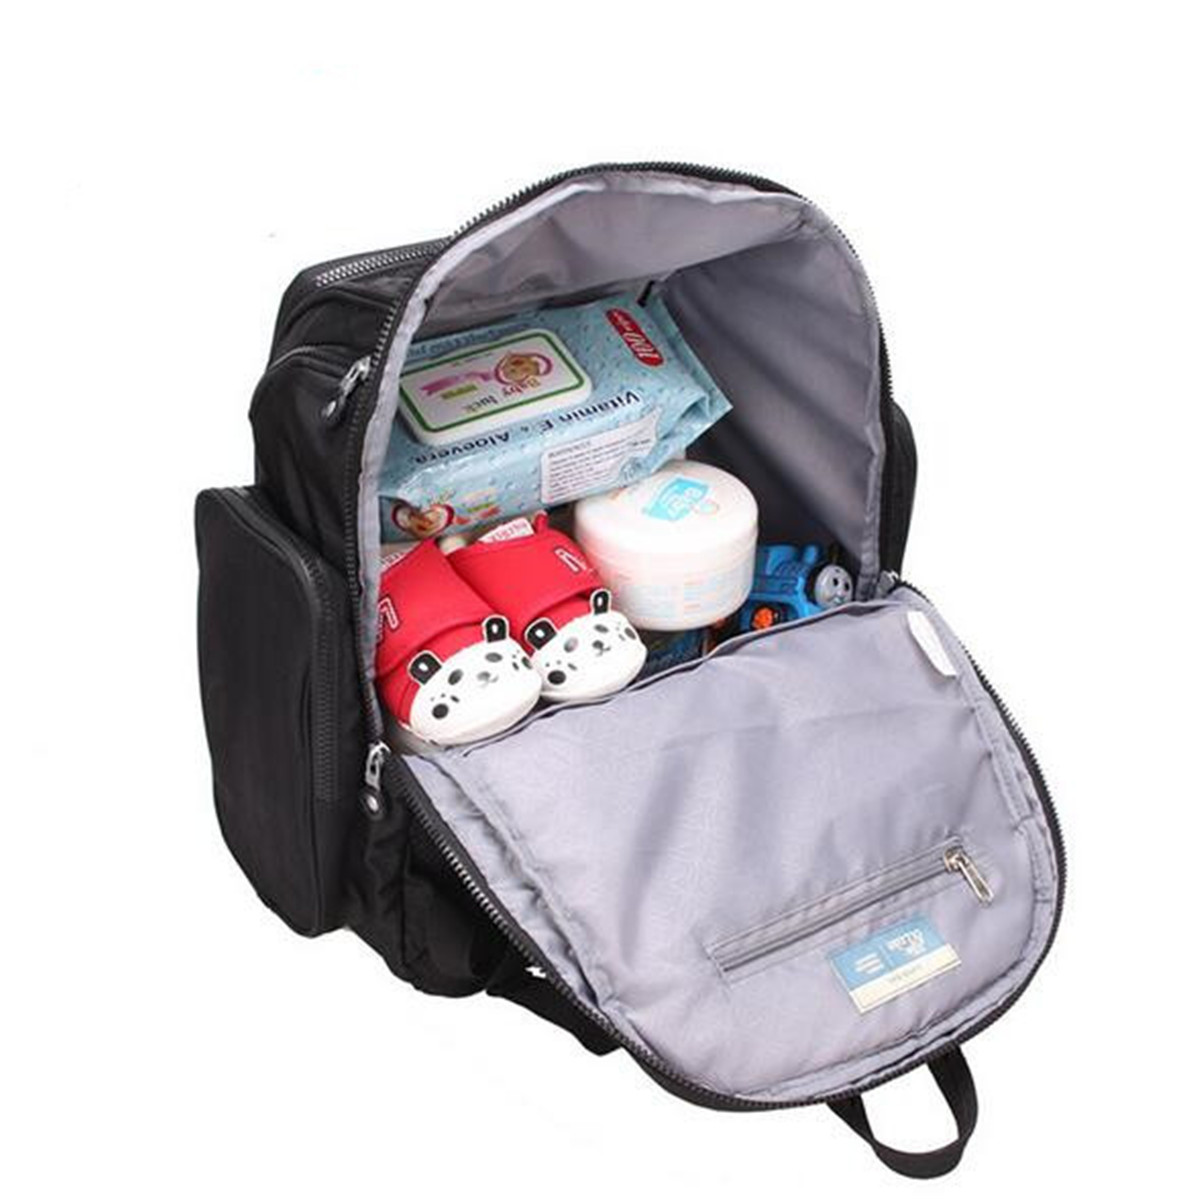 Fashion Baby Diaper Nappy Mummy Bag Maternity Women s Handbag Backpack  Organizer 1e13f682e0